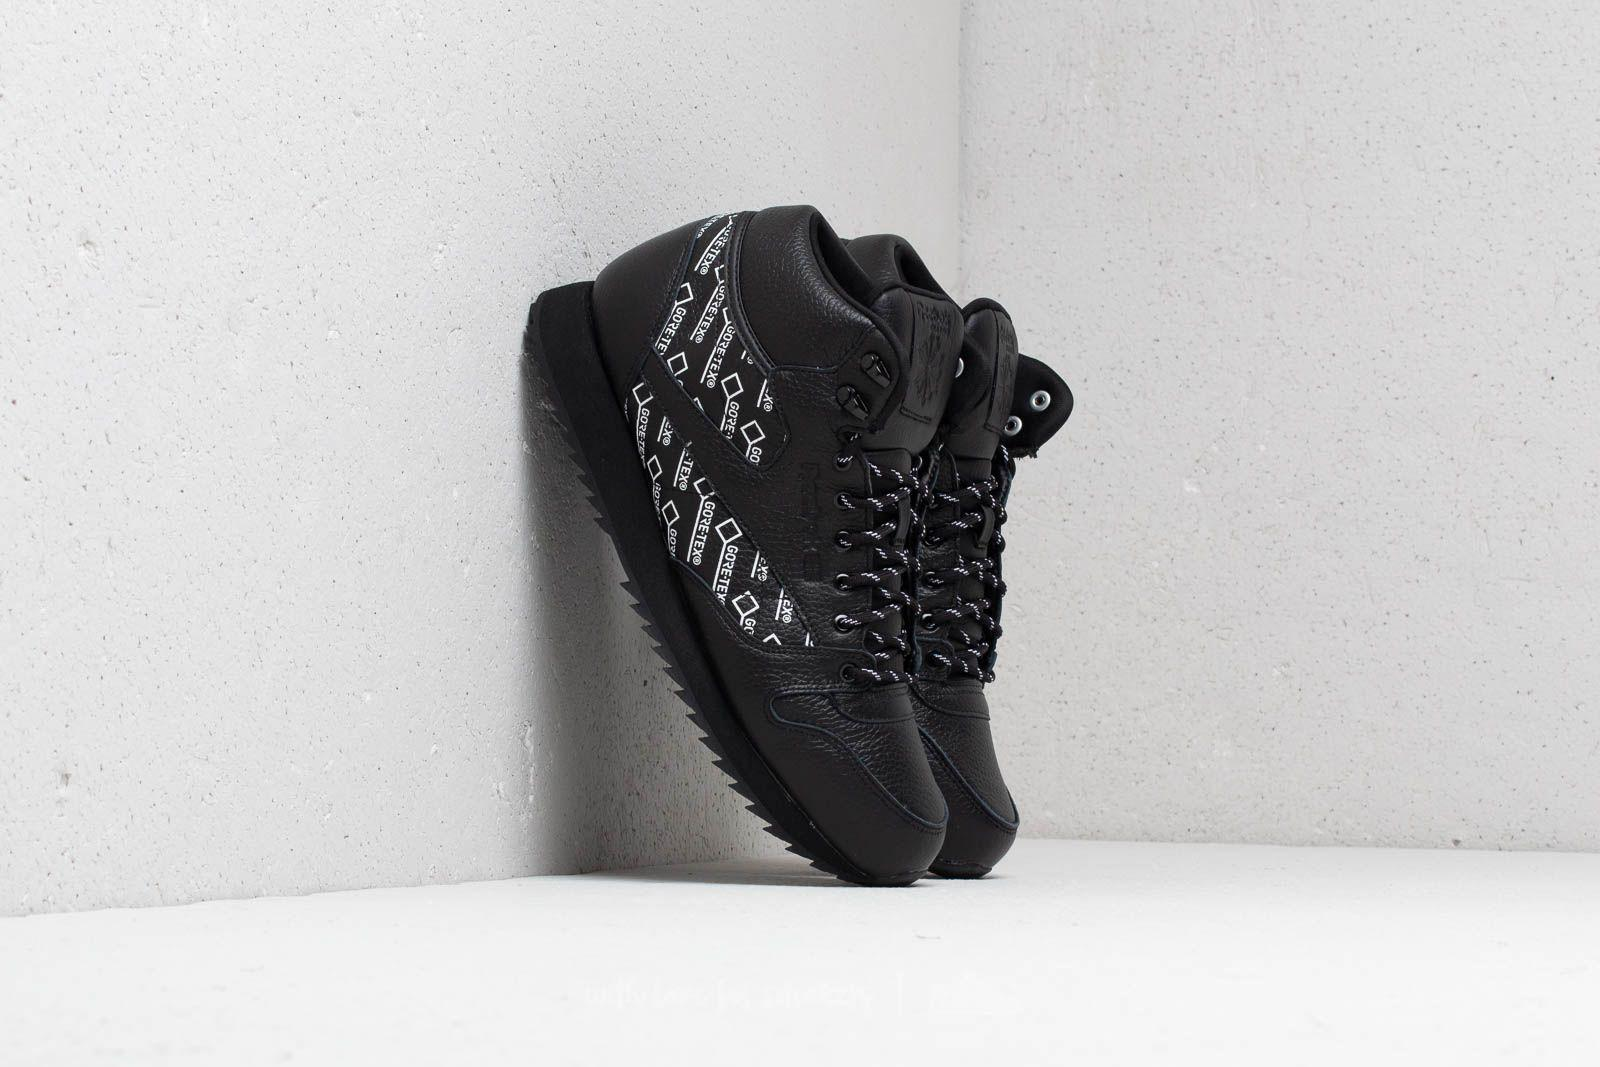 bd2711701955 Lyst - Reebok Reebok Cl Leather Mid Ripple Gore-tex Black  White in ...